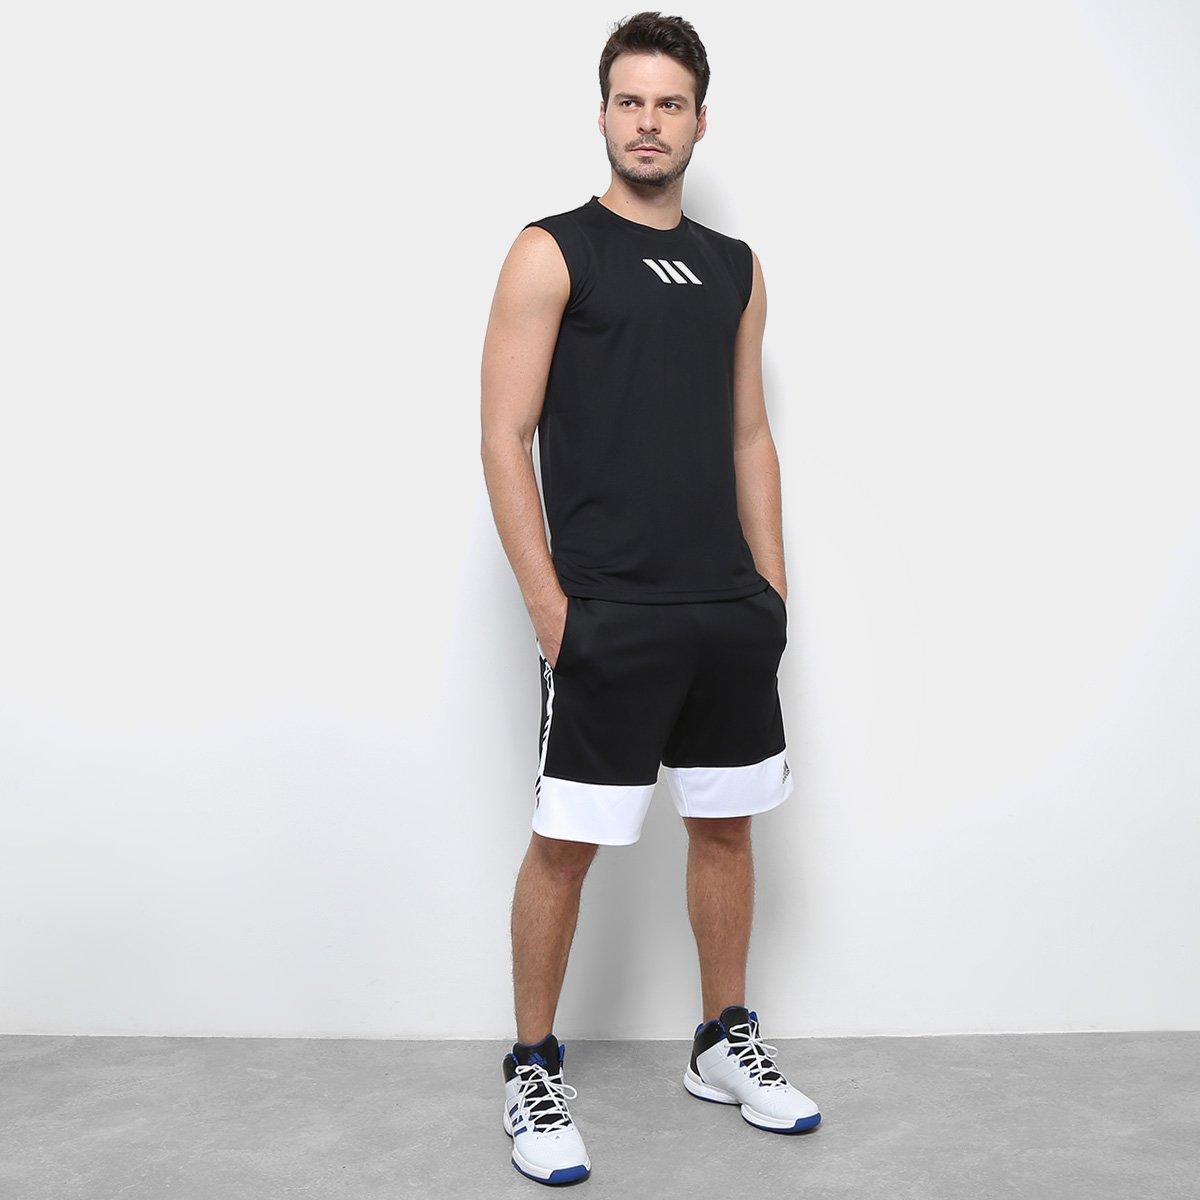 b26249cb22 Regata Adidas Q2 Pro Madness Tank Masculina - Tam  P - Shopping TudoAzul